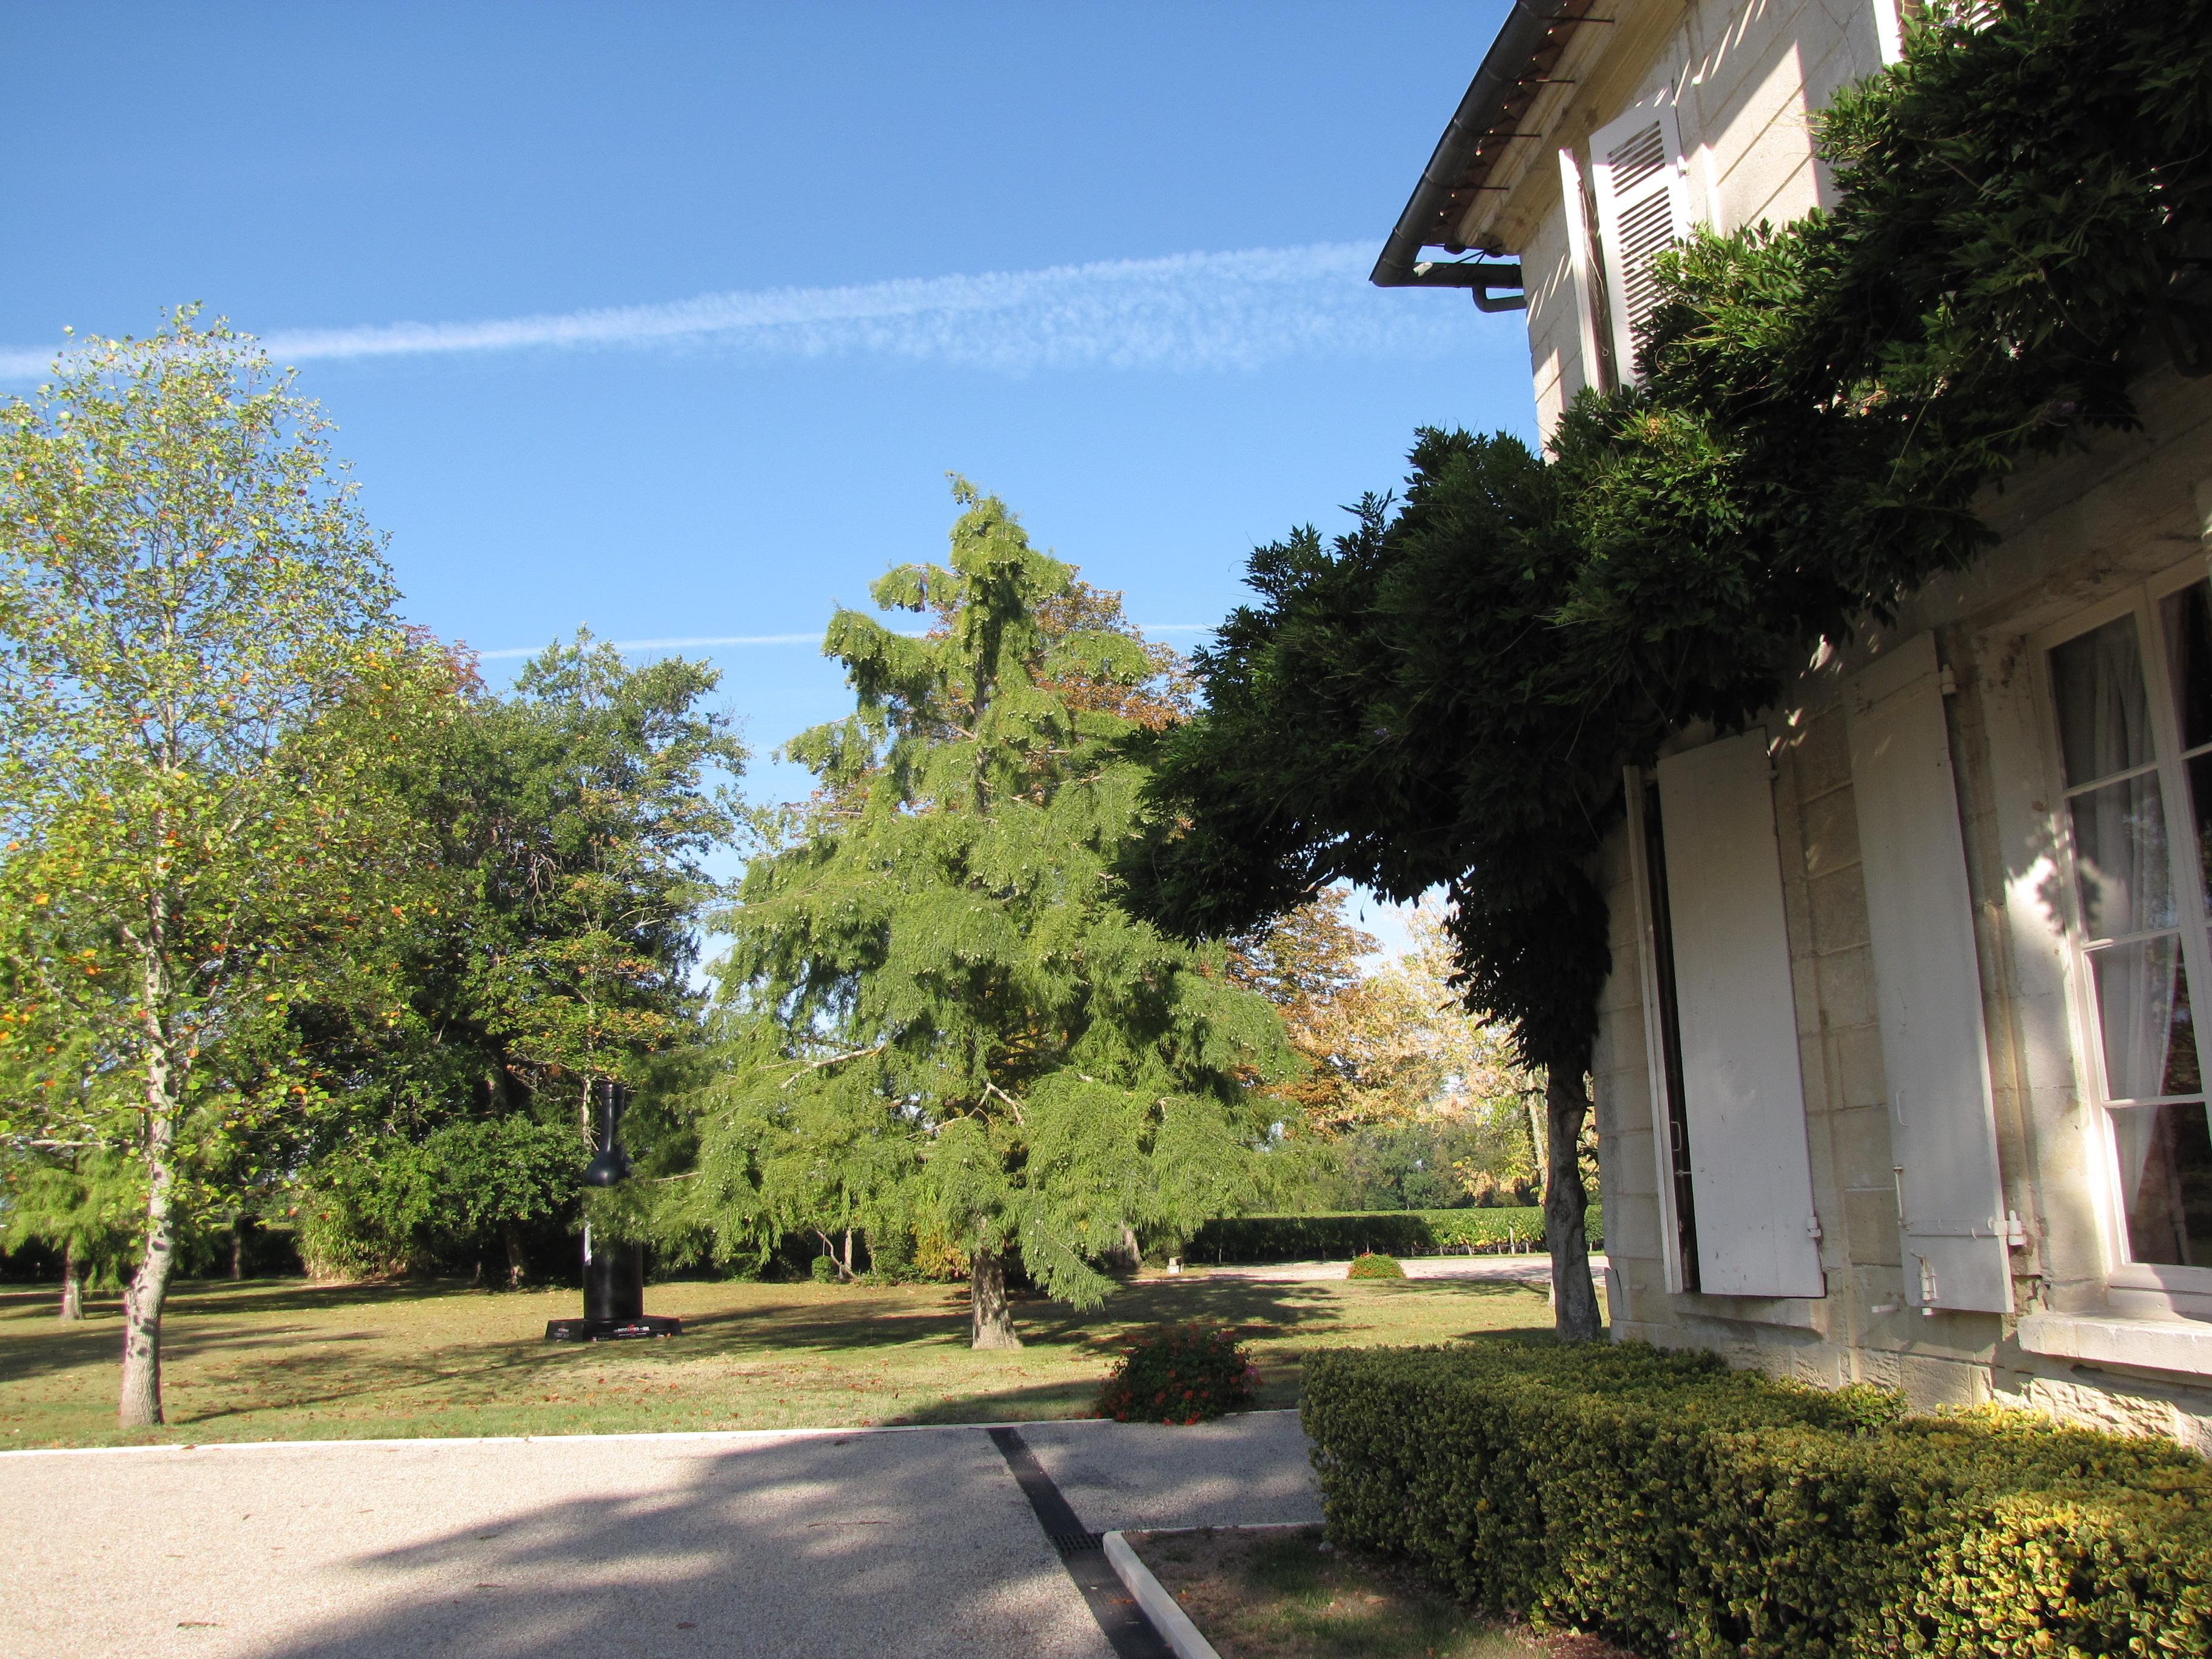 Enjoy with style grandhotel bordeaux france house - Petuaud letang ...